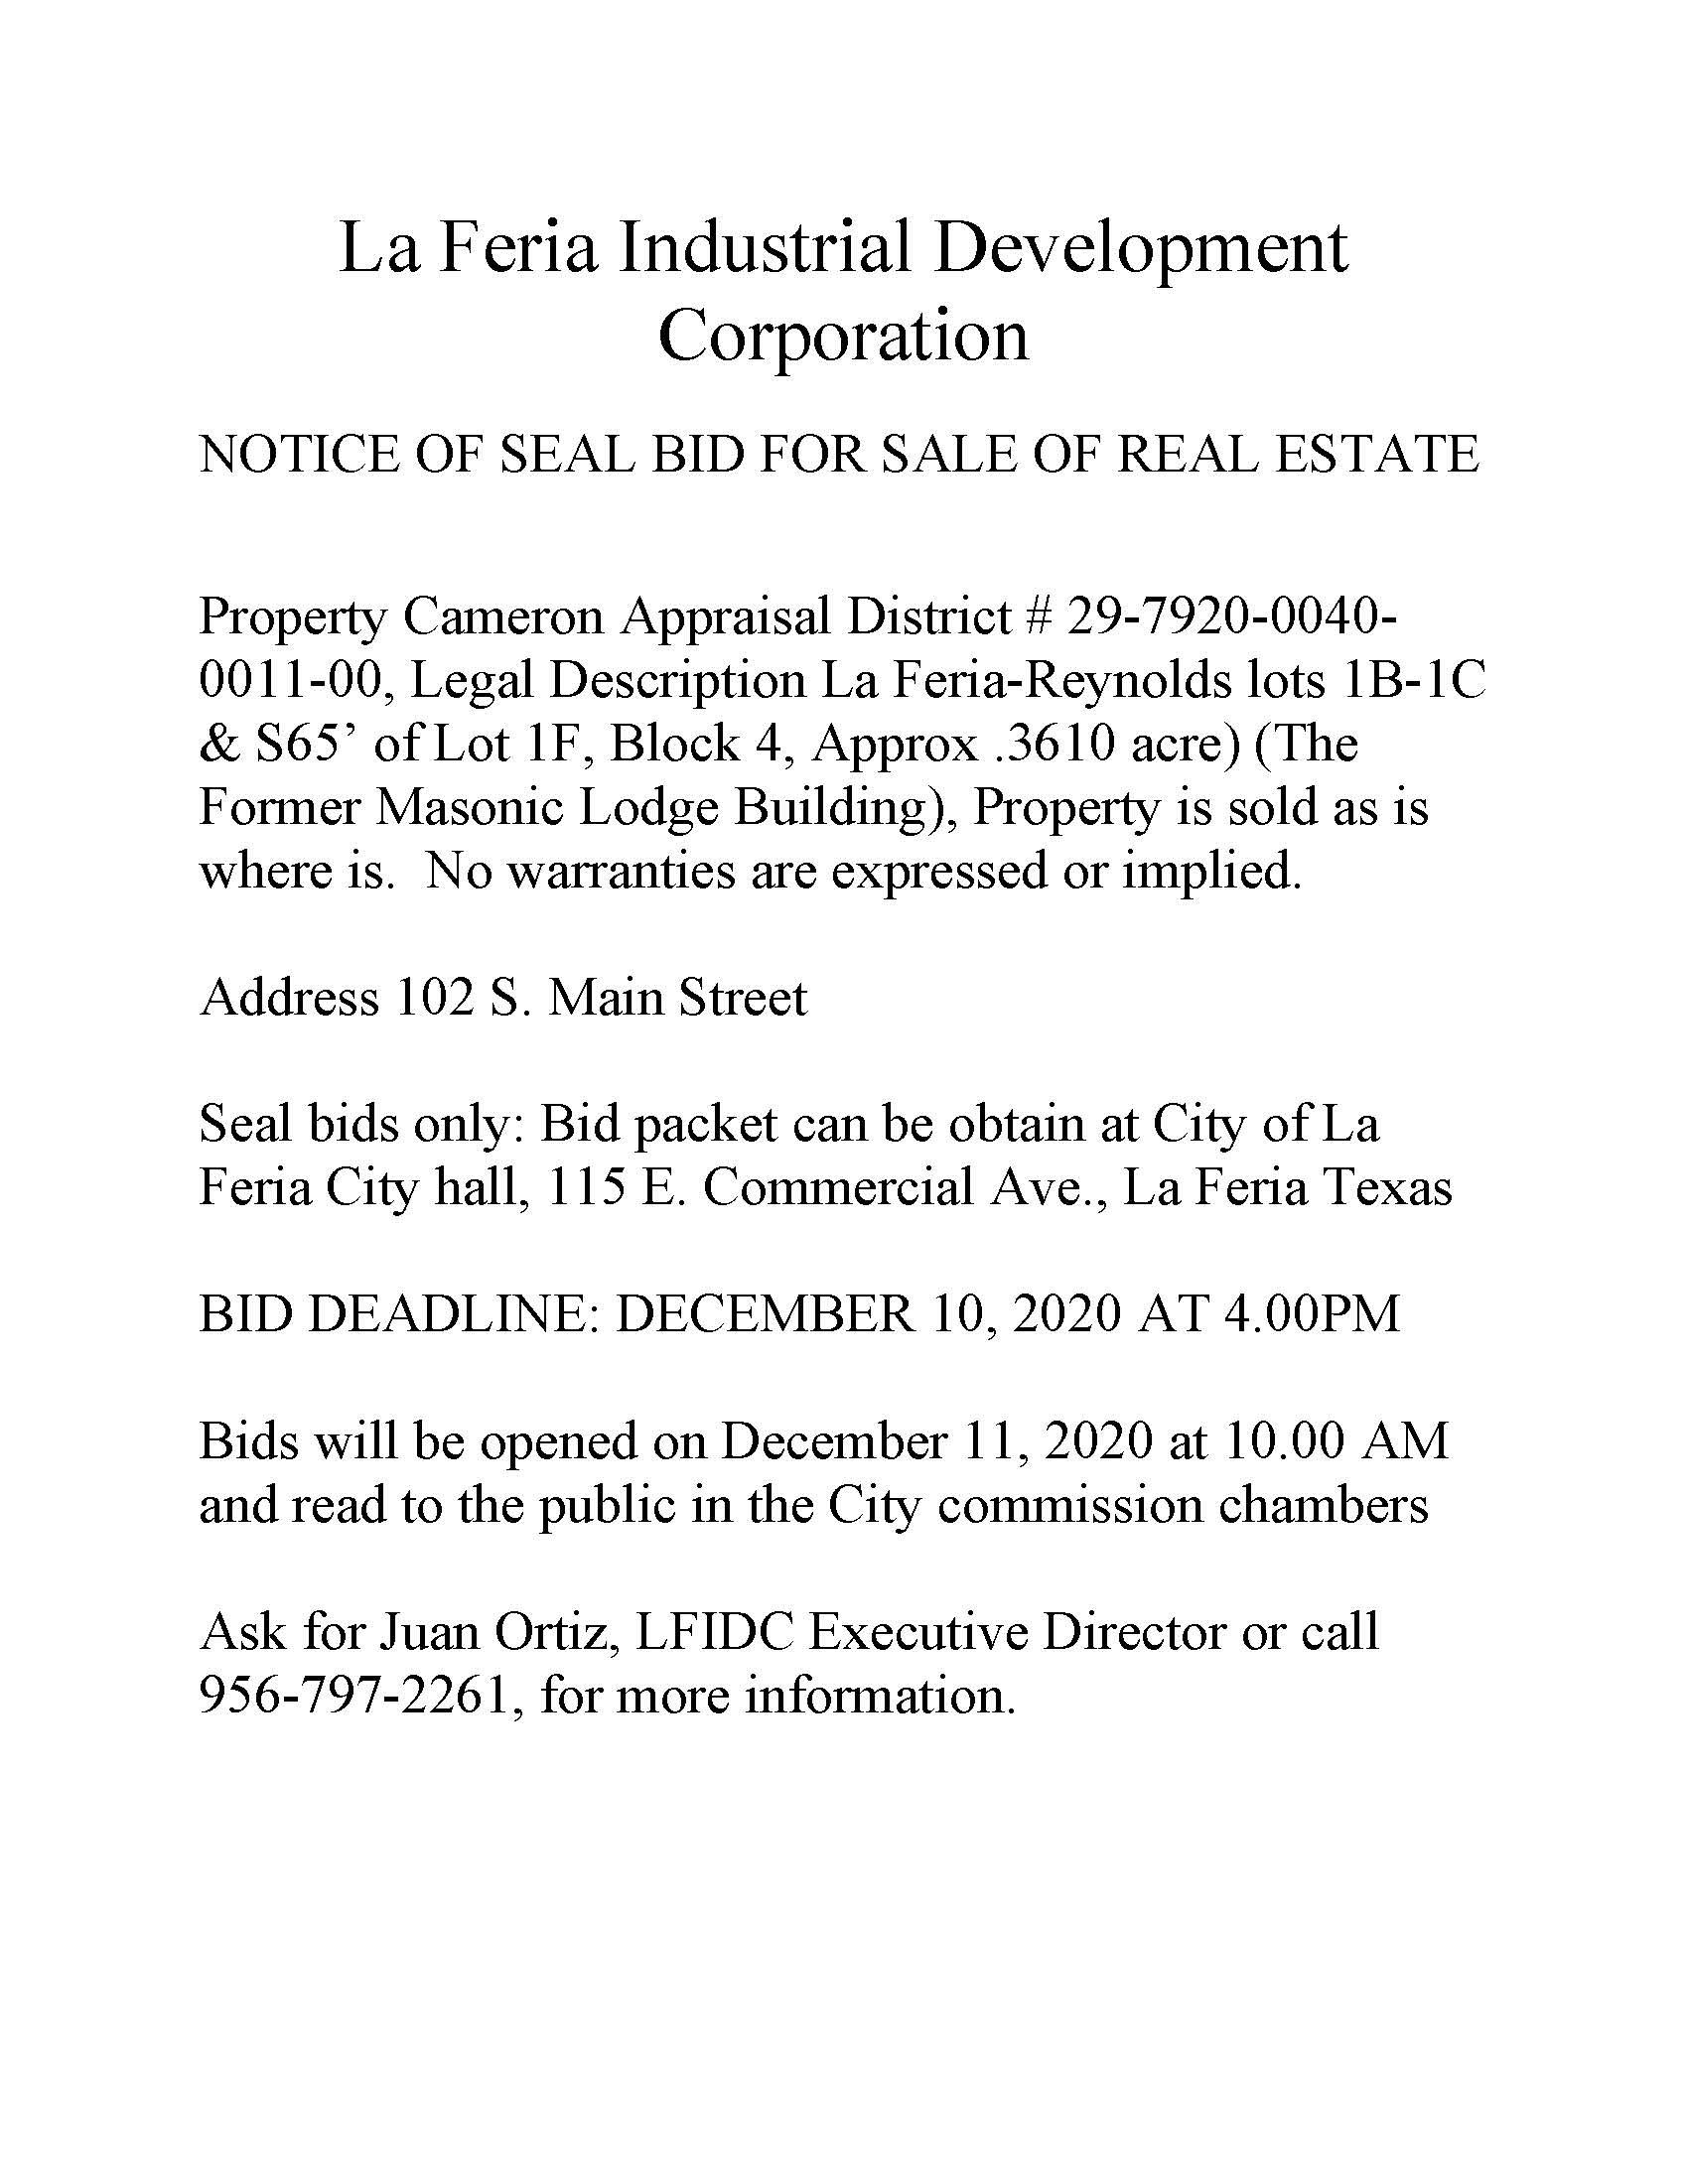 LFIDC Salee of land ad Nov 2020